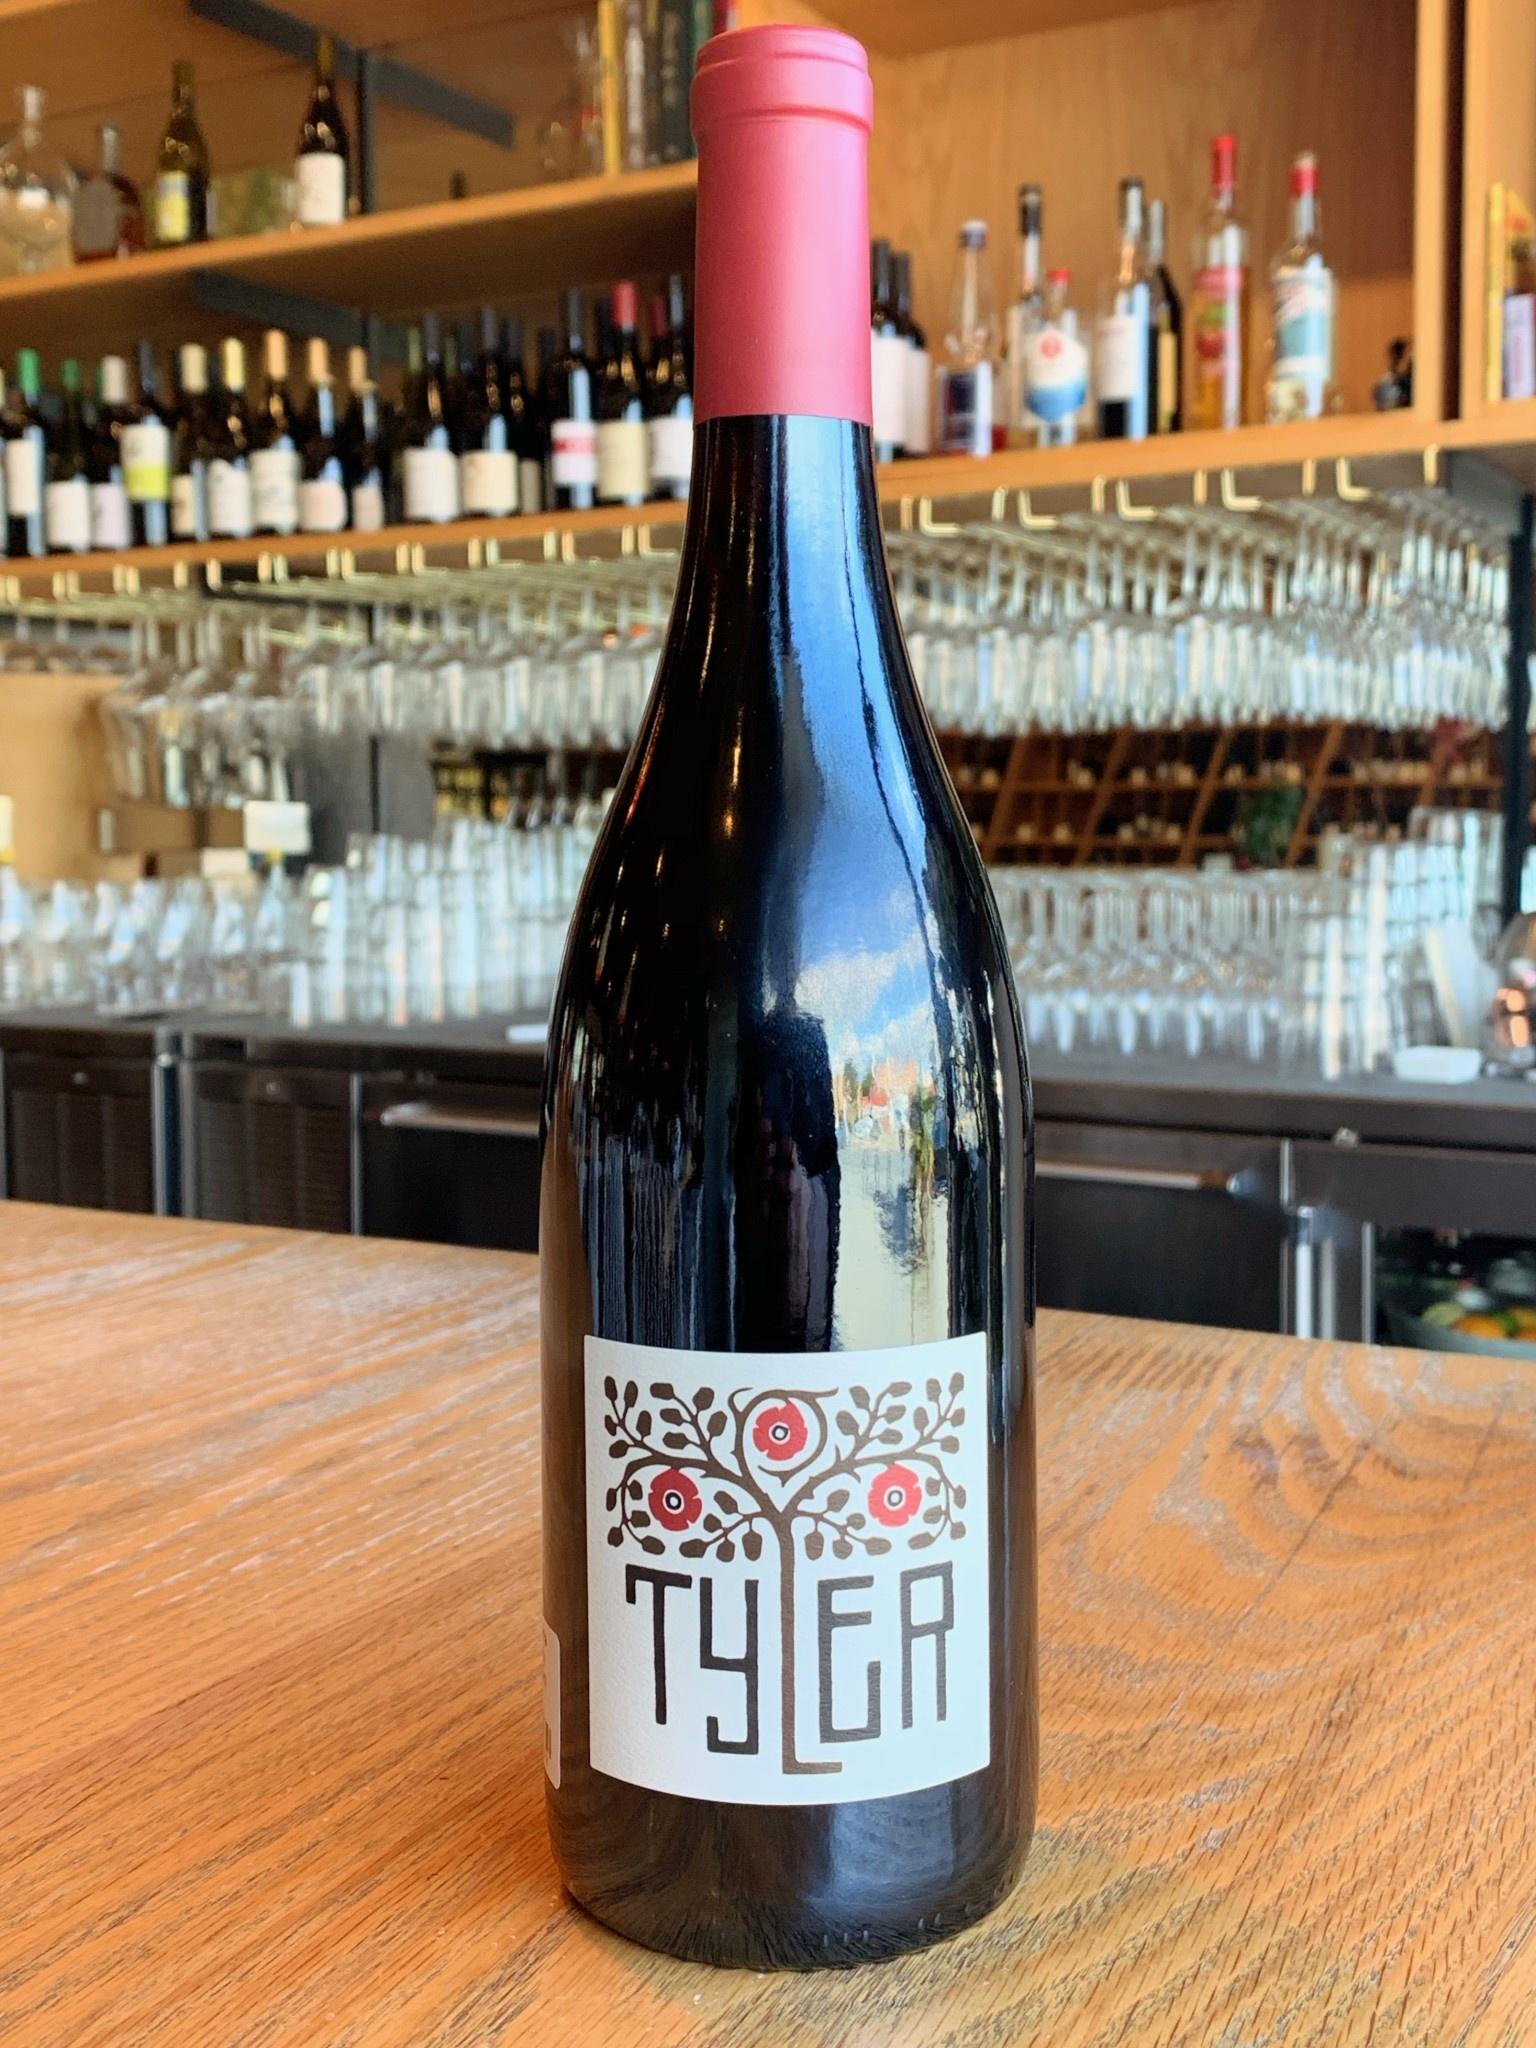 Tyler 2018 Tyler Santa Barbara County Pinot Noir 750ml